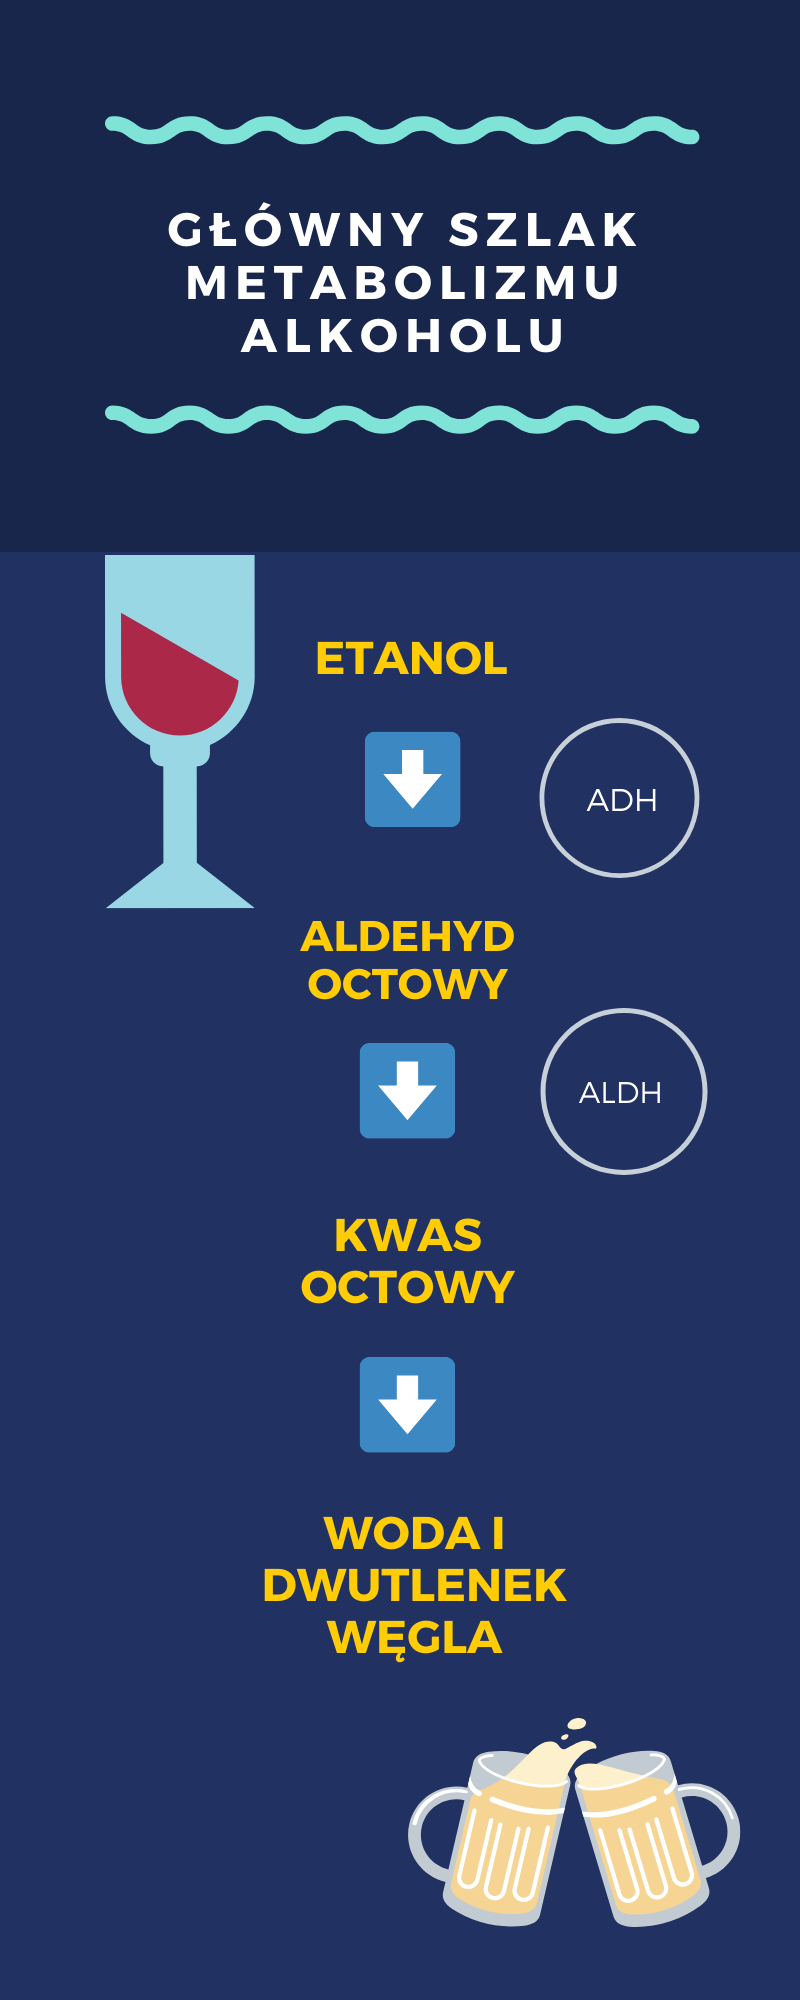 Alkohol i jego metabolizm